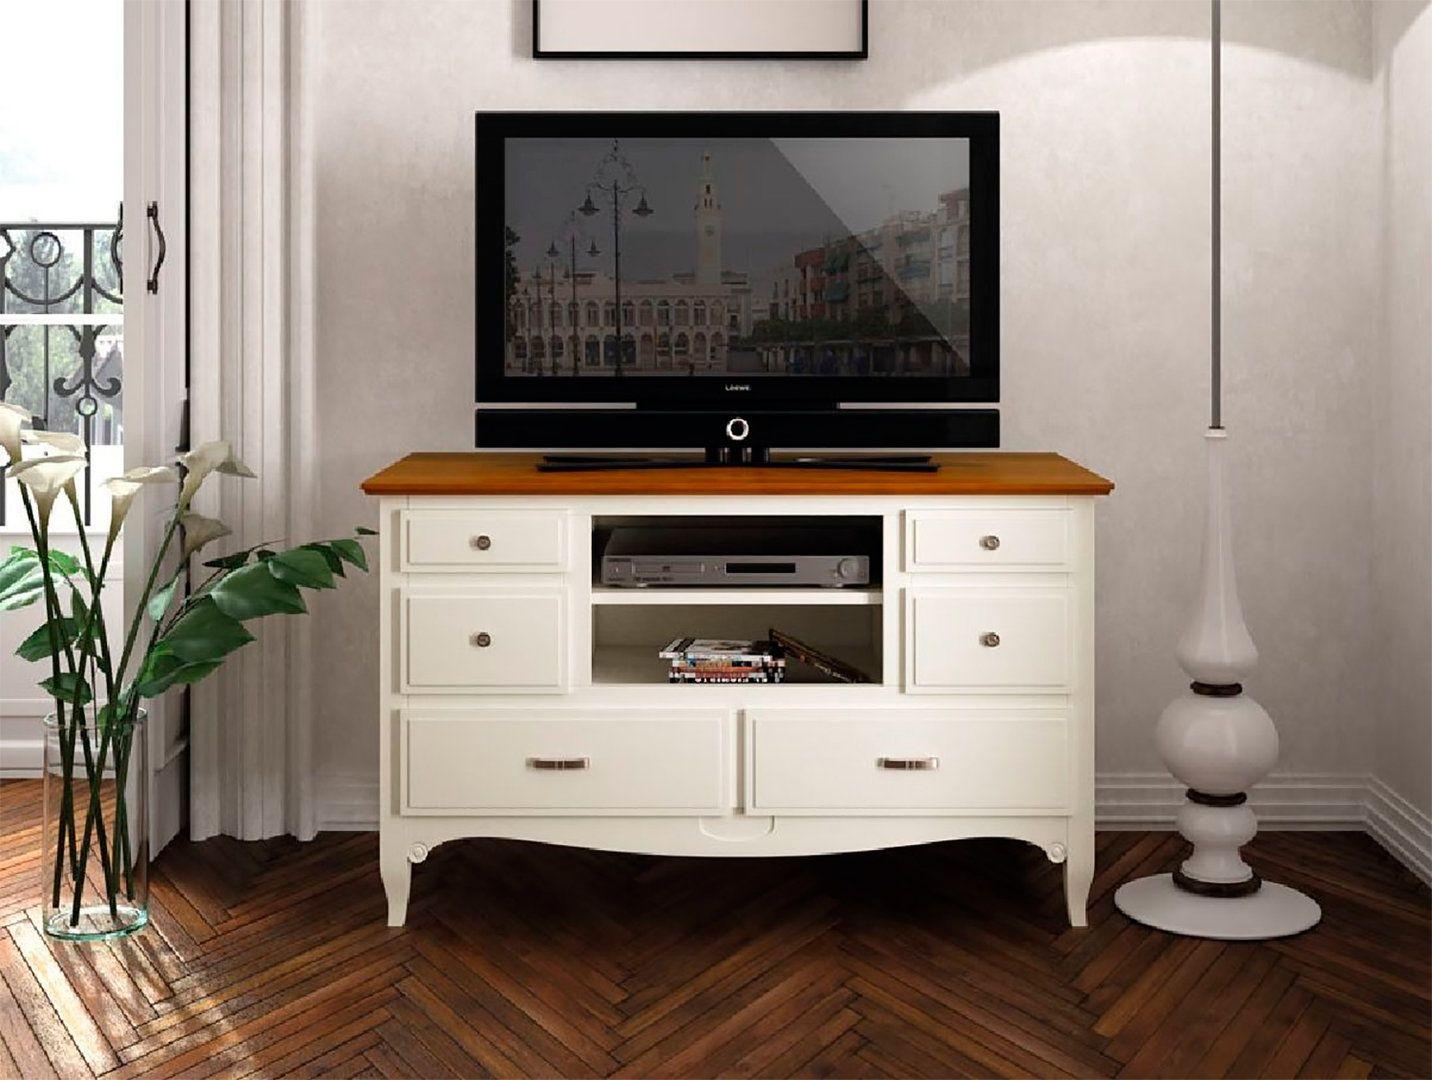 Mueble De Tv Rovenzal Fontana 120 Cm Sal N Pinterest Muebles  # Muebles Fontana